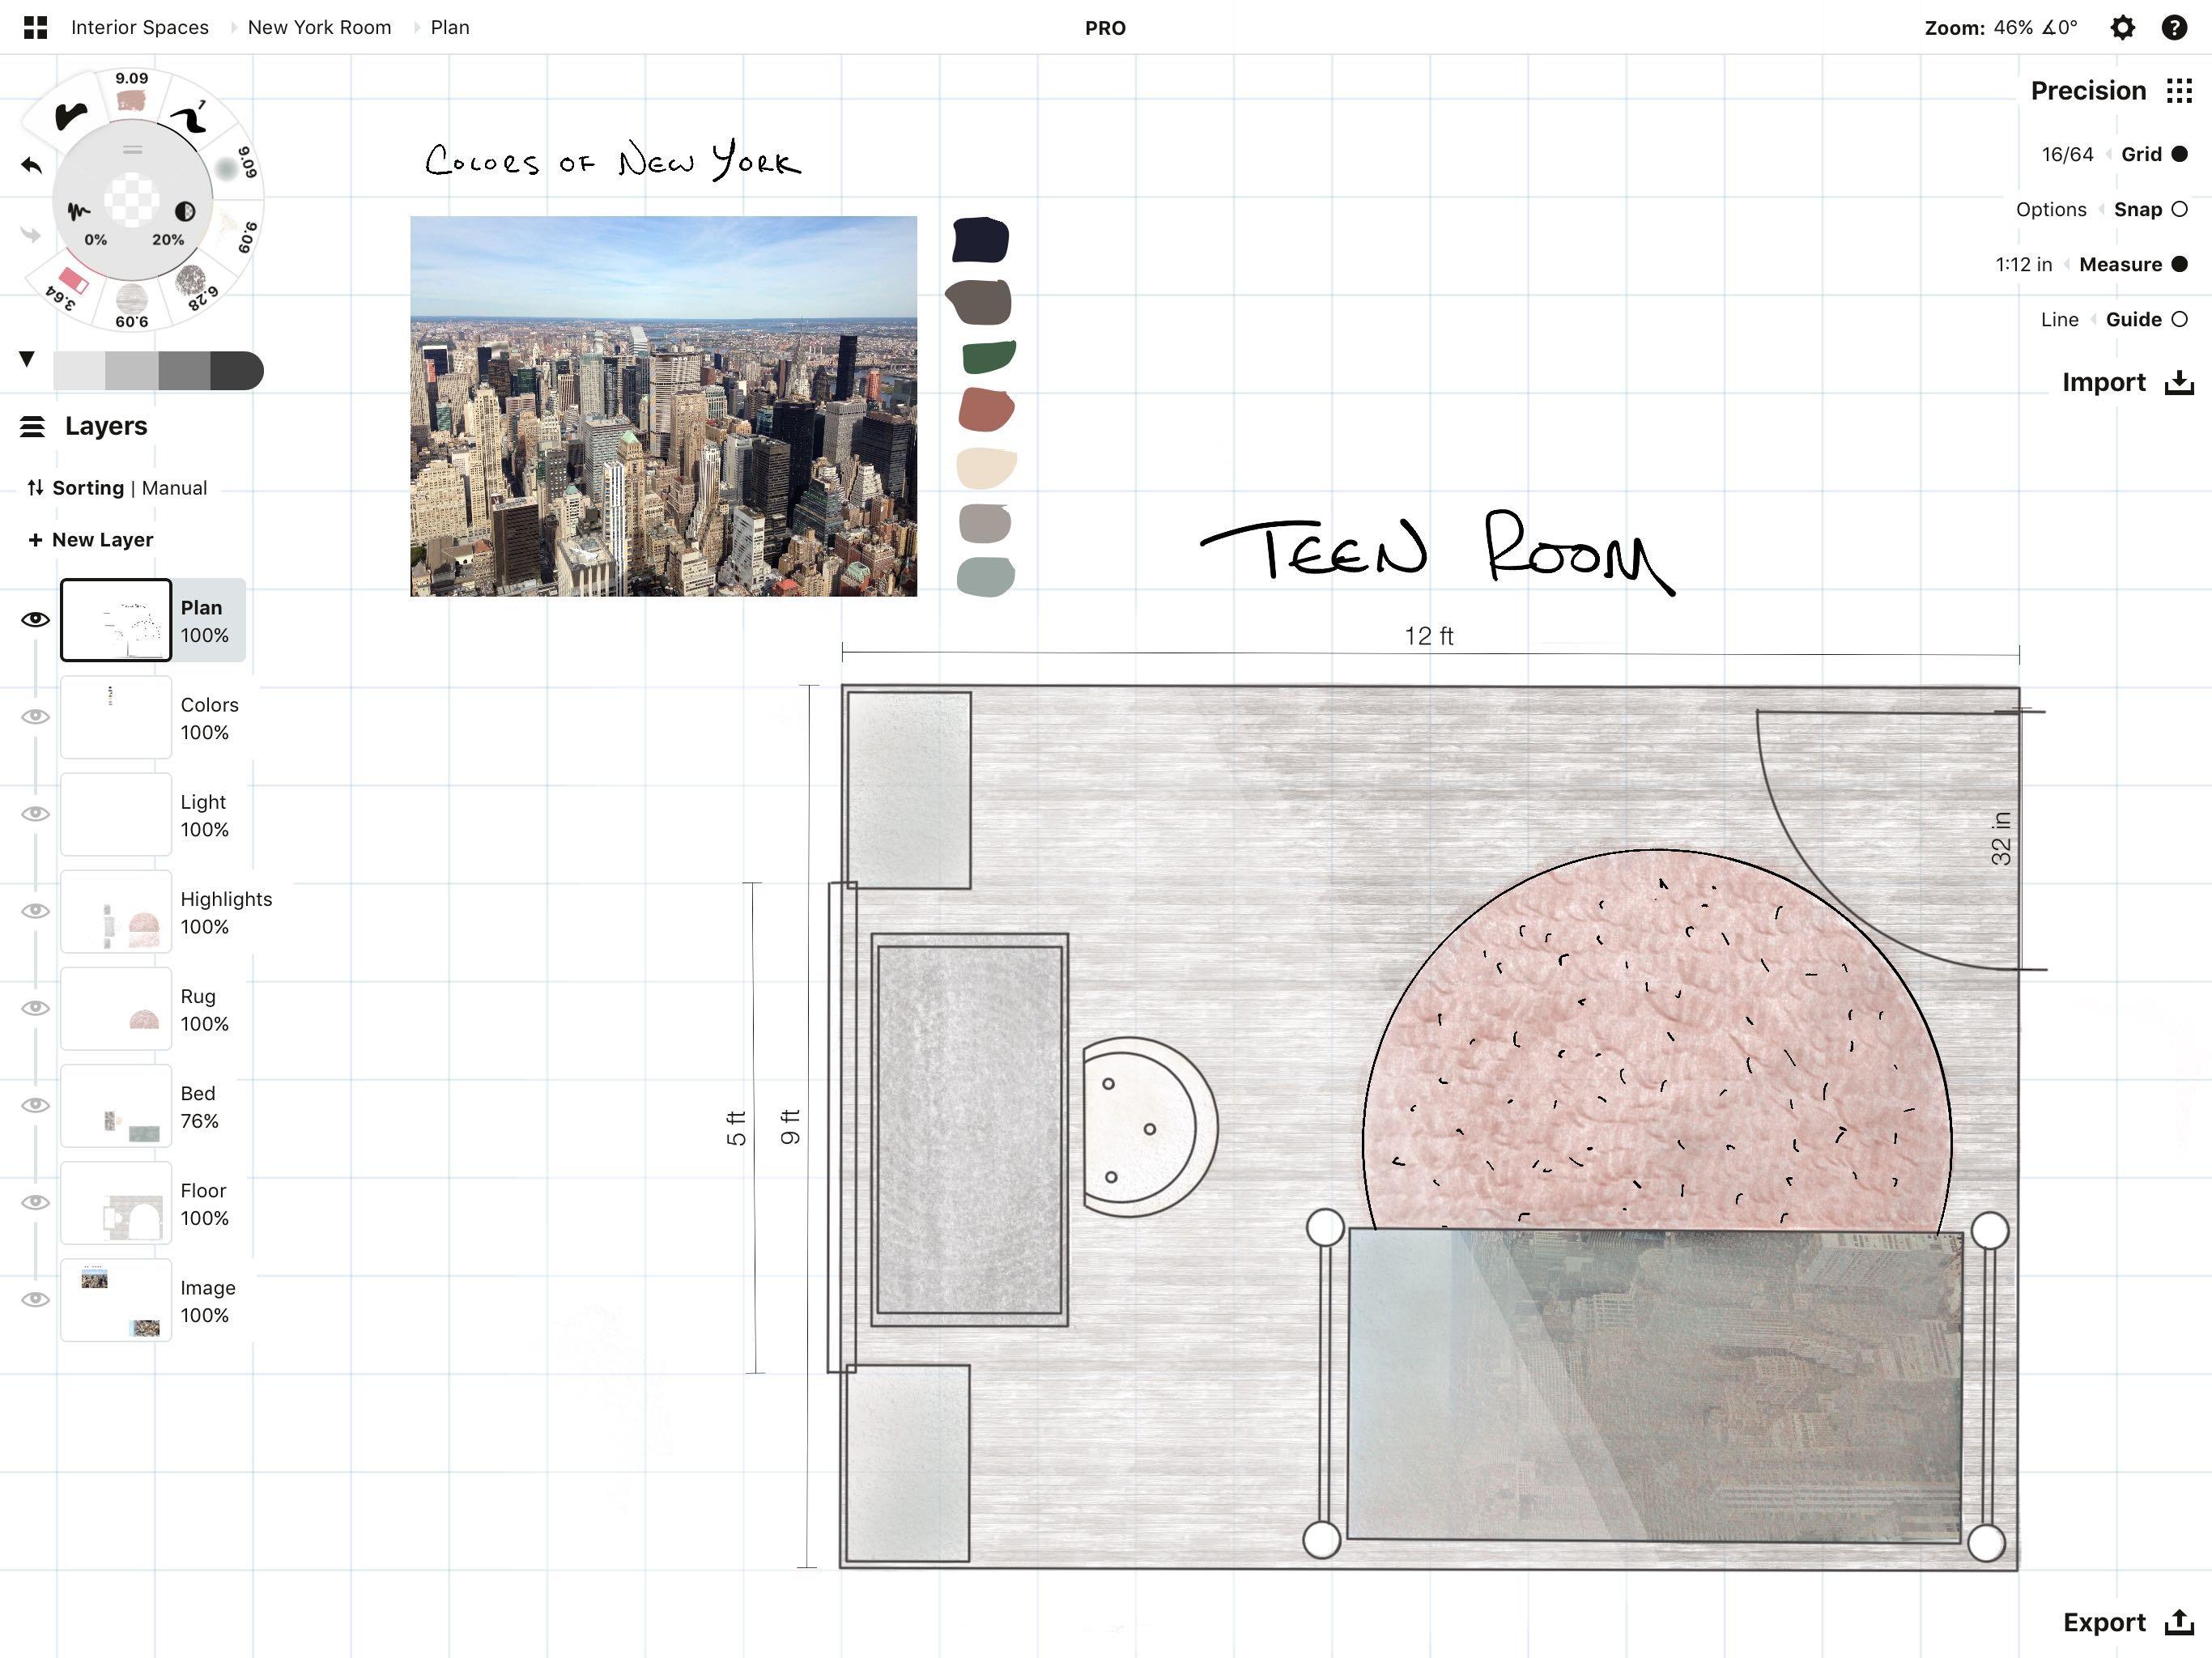 layers_design_plan.JPG